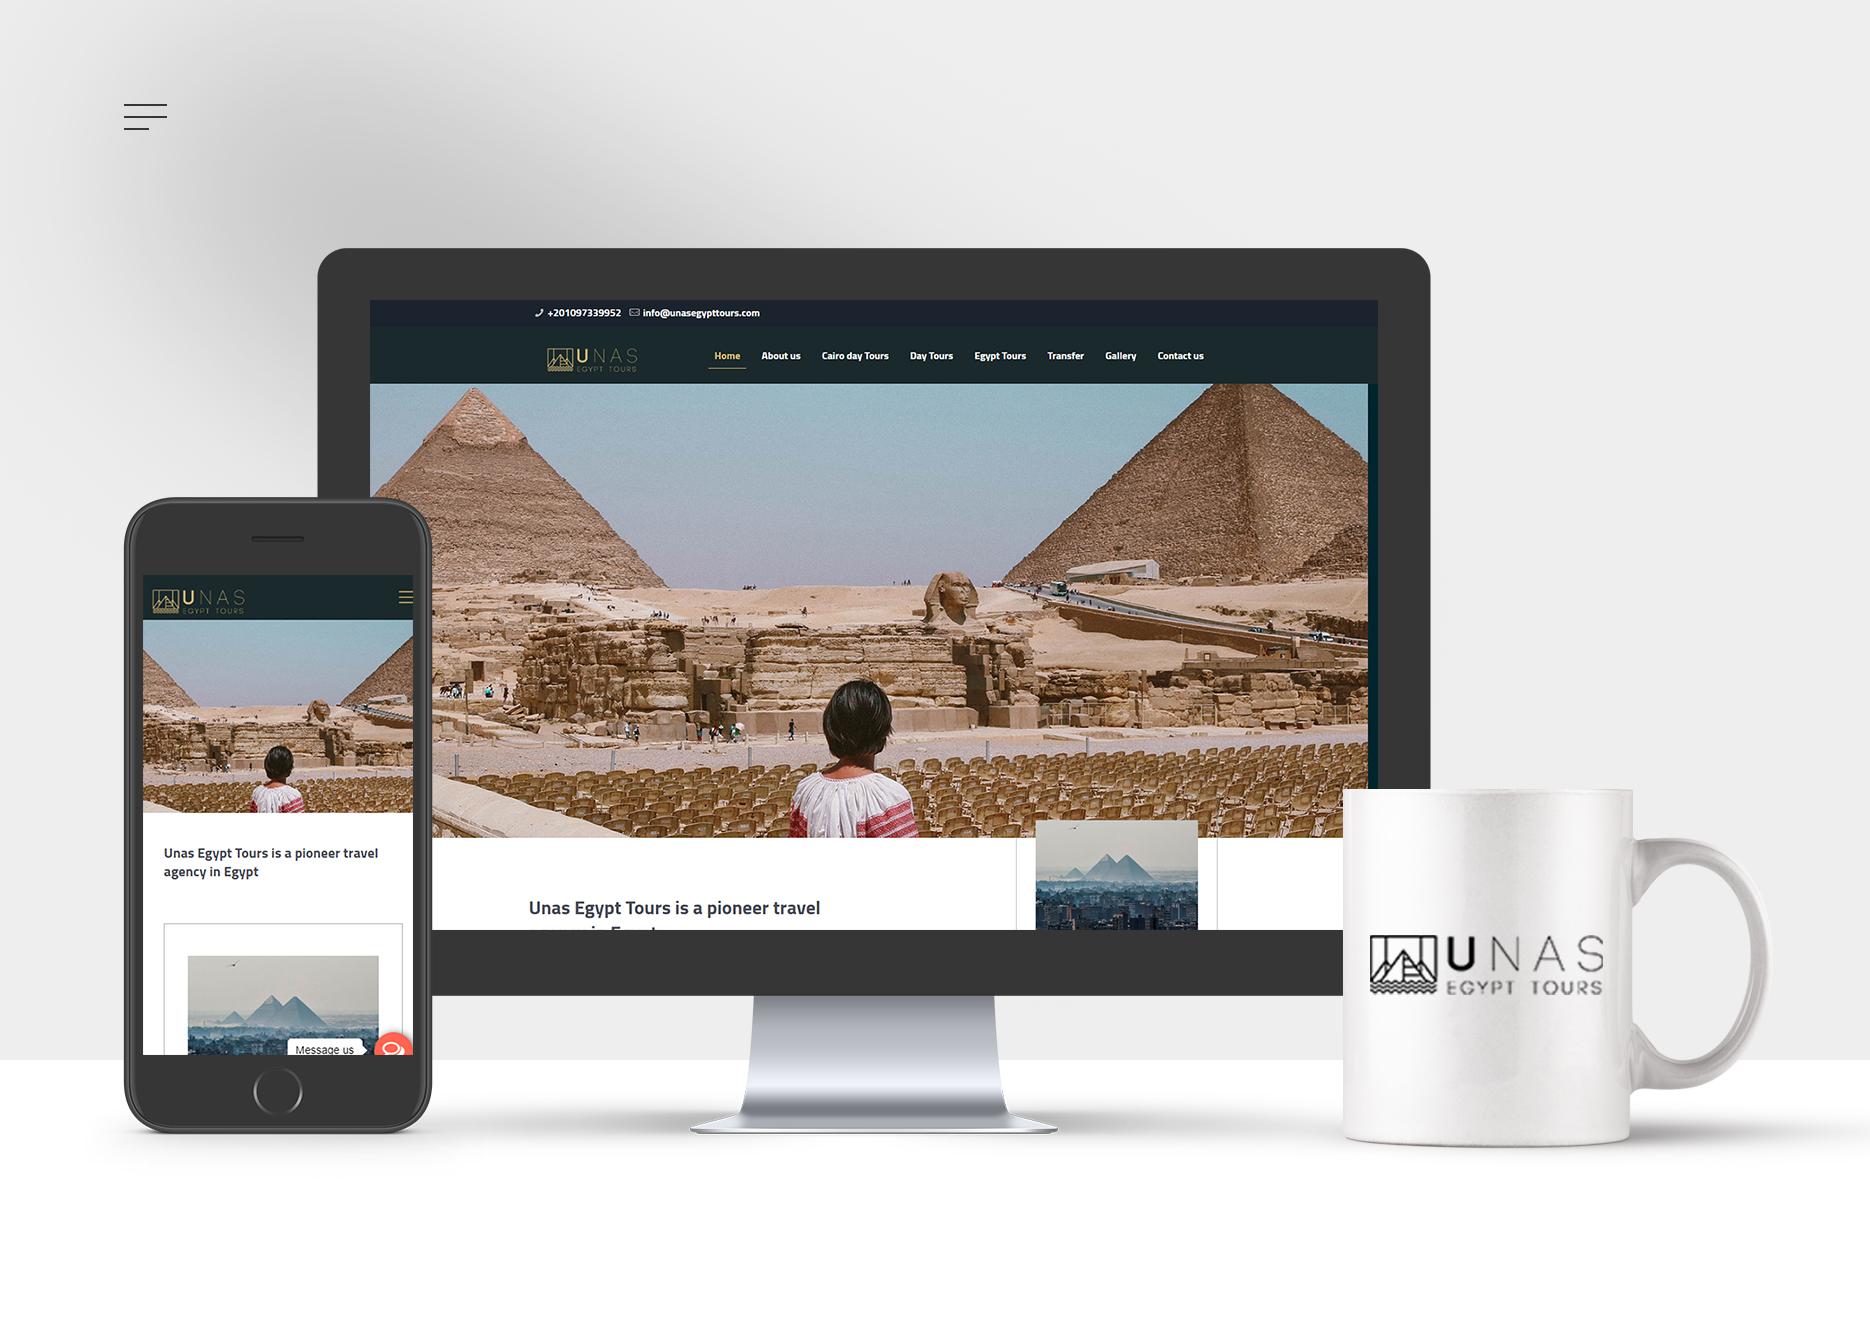 Unas Egypt